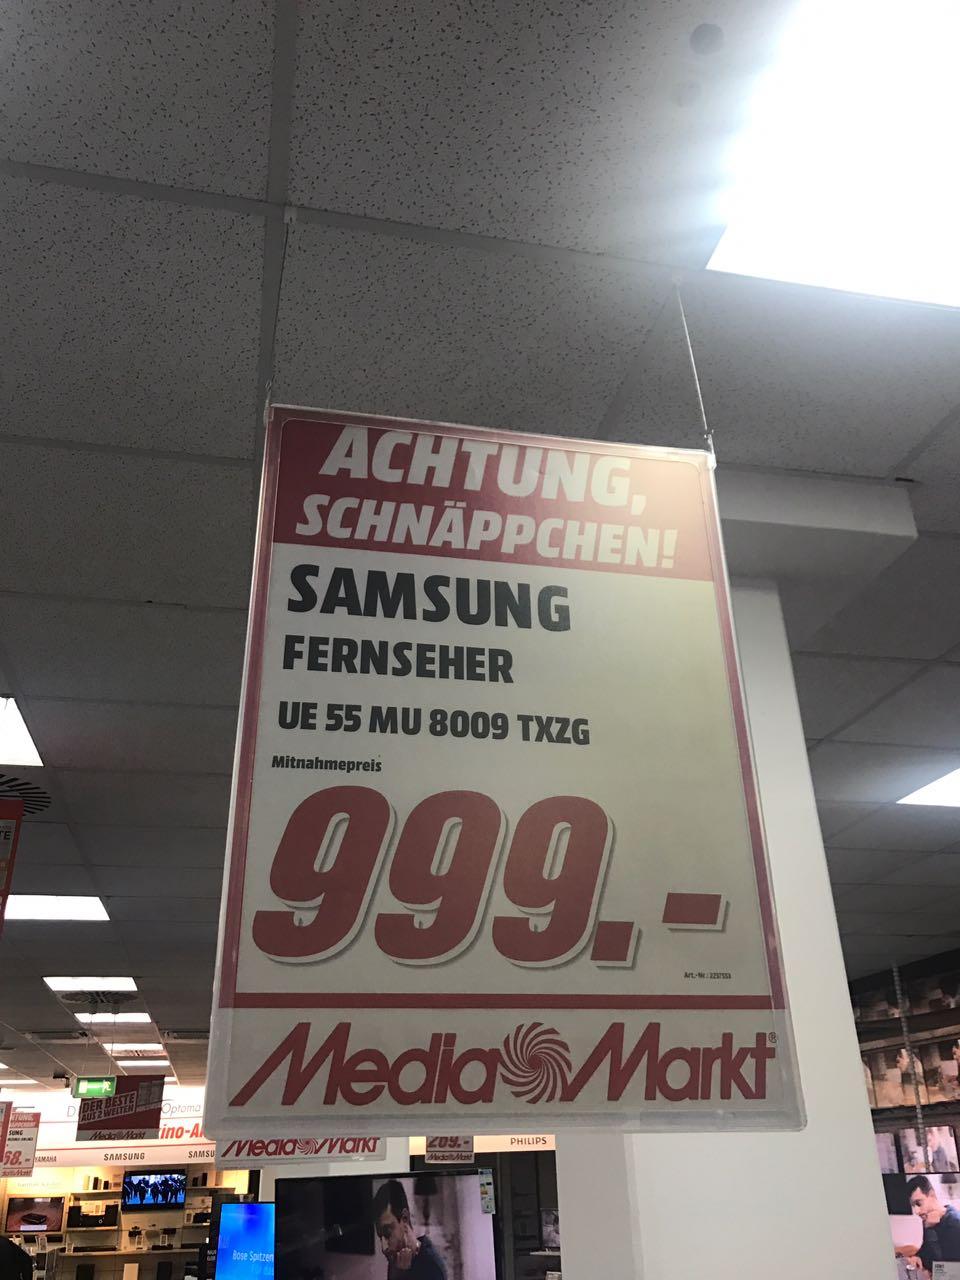 [LOKAL] MM Aschaffenburg - Samsung 55 MU 8009 (4K, 120hz Nativ, Smart TV, PVR, Twin Triple Tuner)